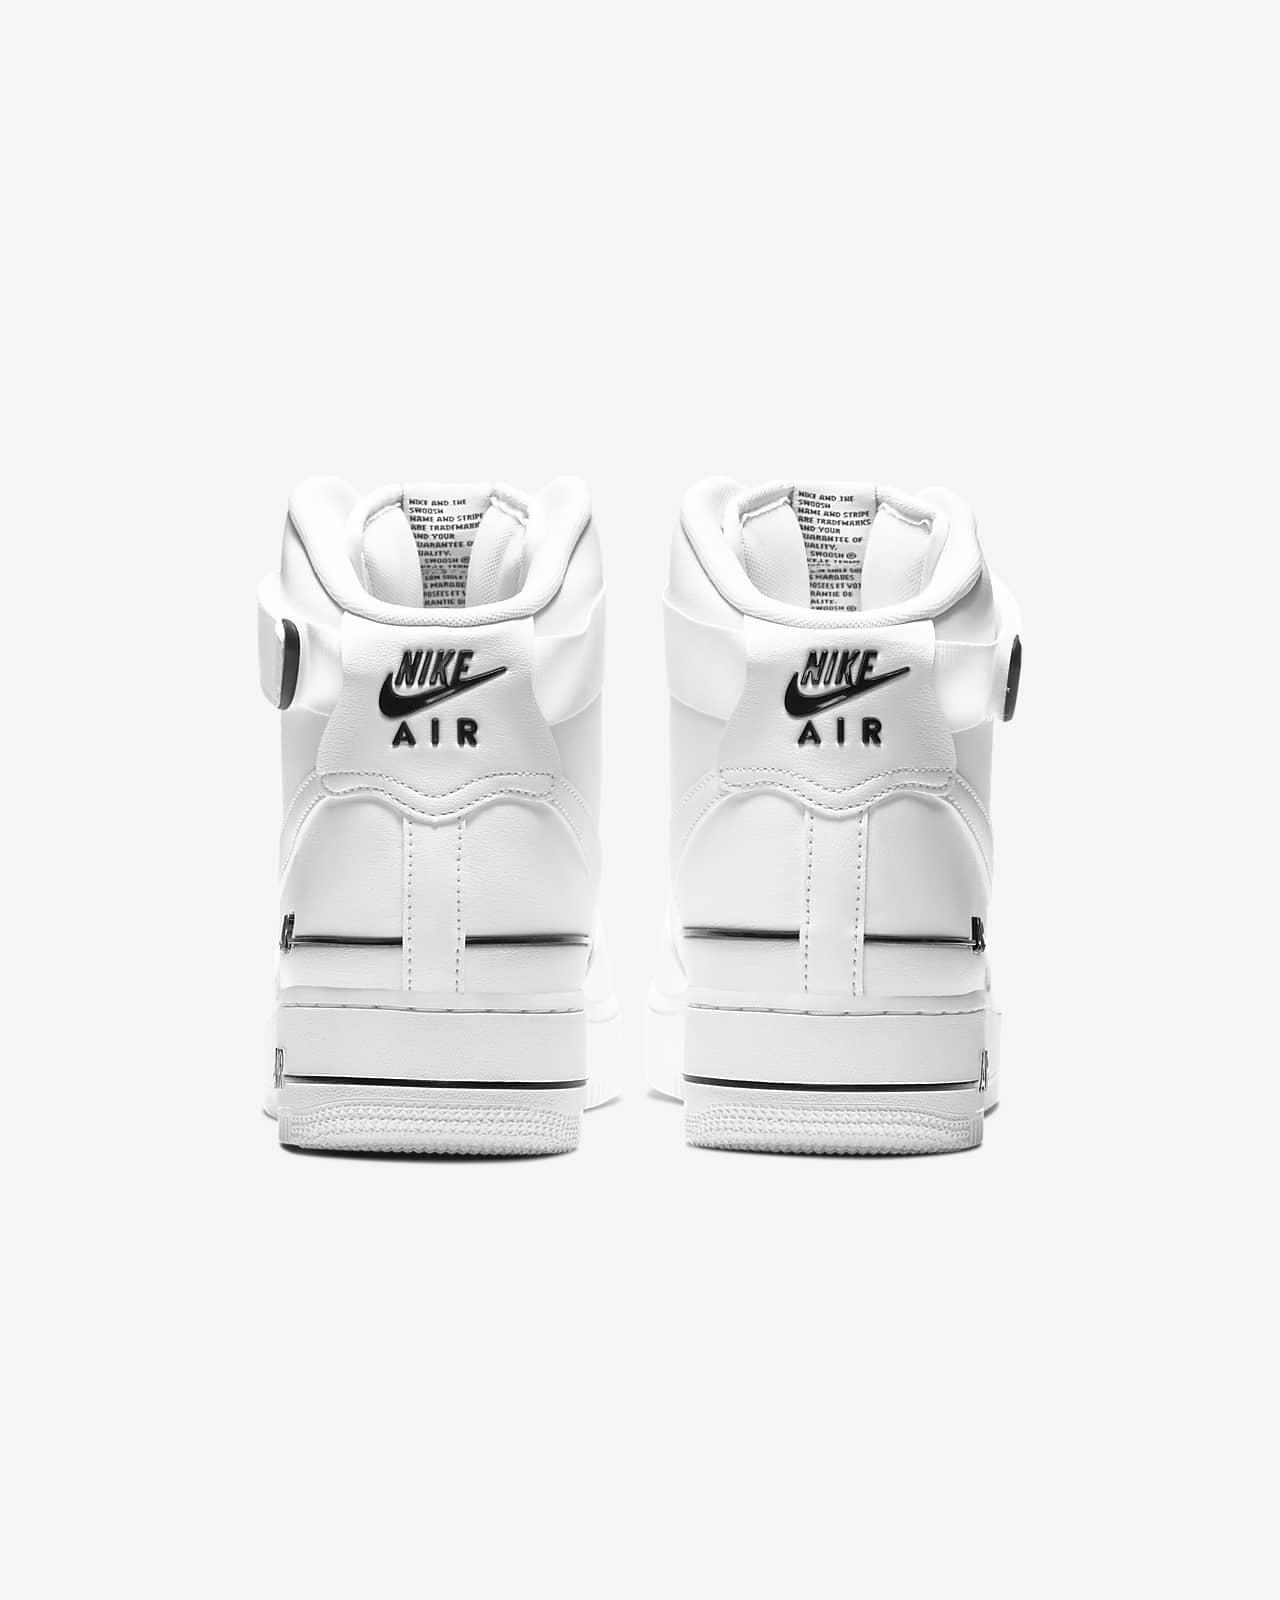 Nike Air Force 1 High '07 LV8 3 Men's Shoe